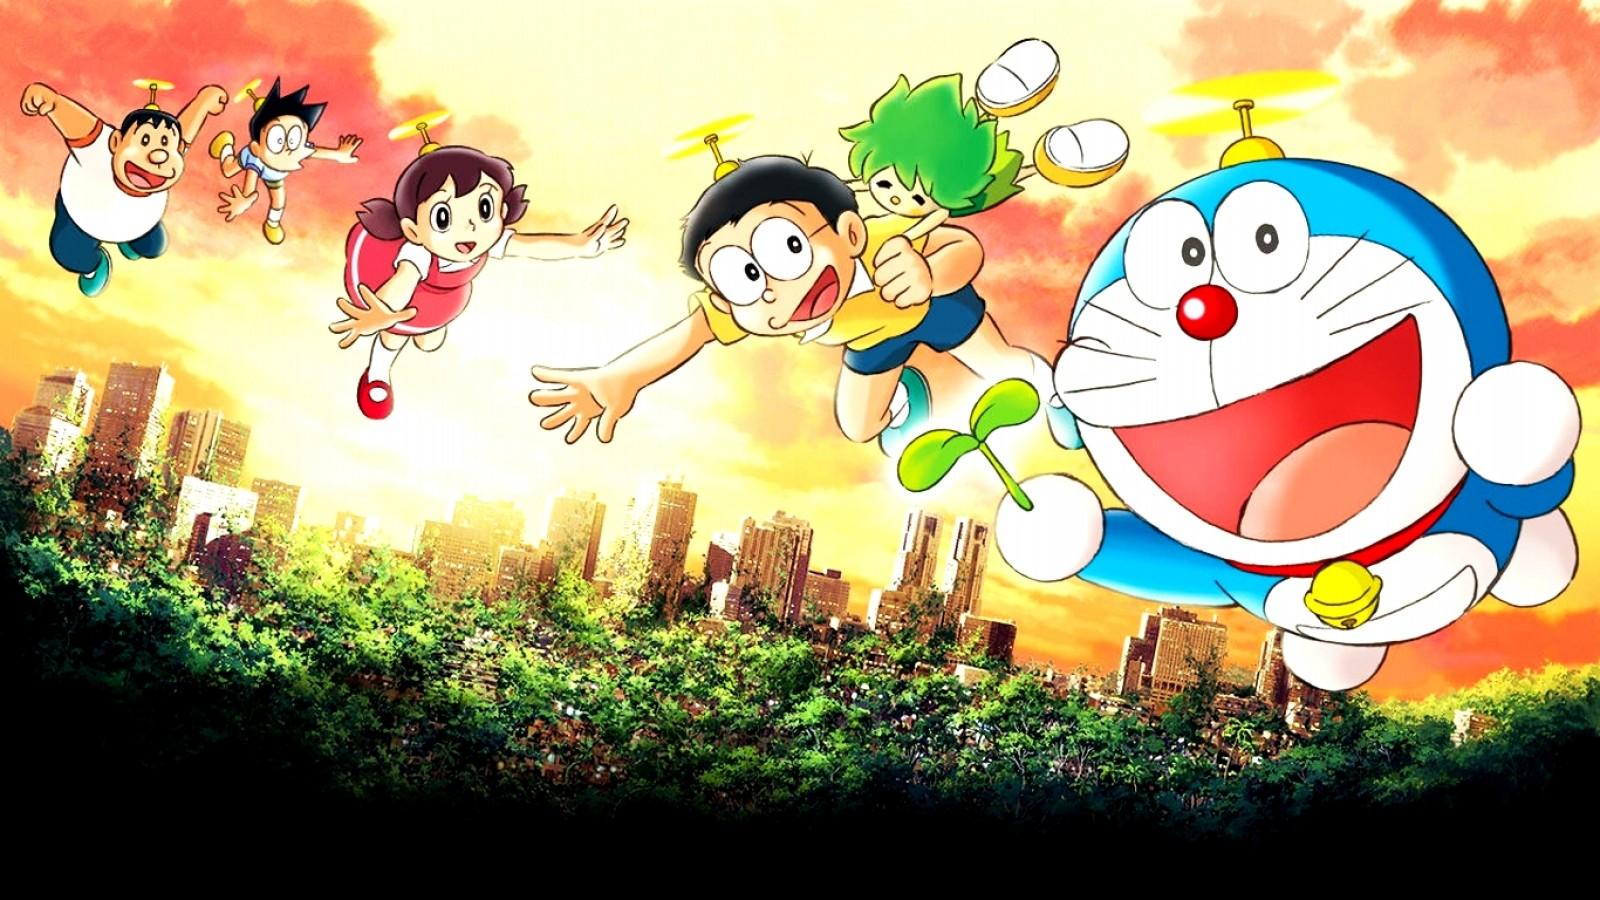 Doraemon Wallpaper Best Collection